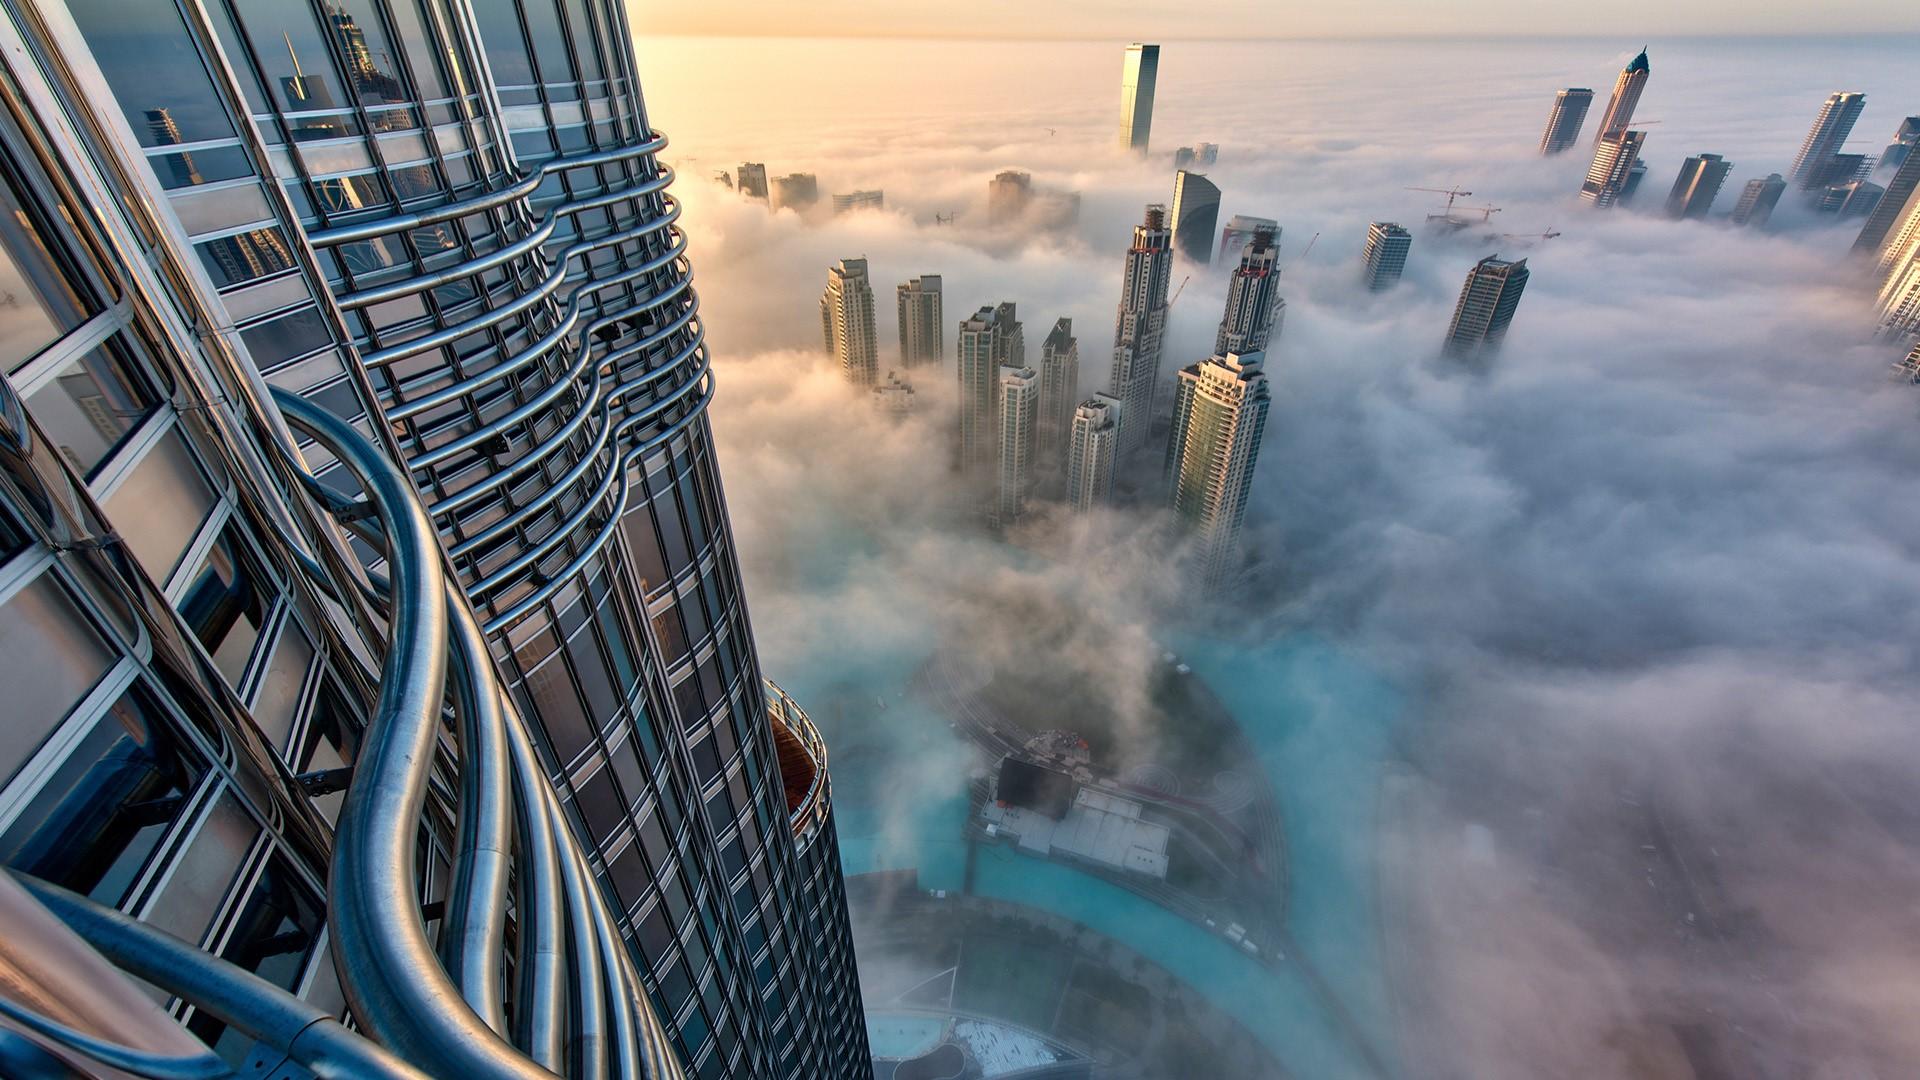 General 1920x1080 aerial view bird's eye view skyscraper cityscape clouds horizon Dubai United Arab Emirates glass Burj Khalifa